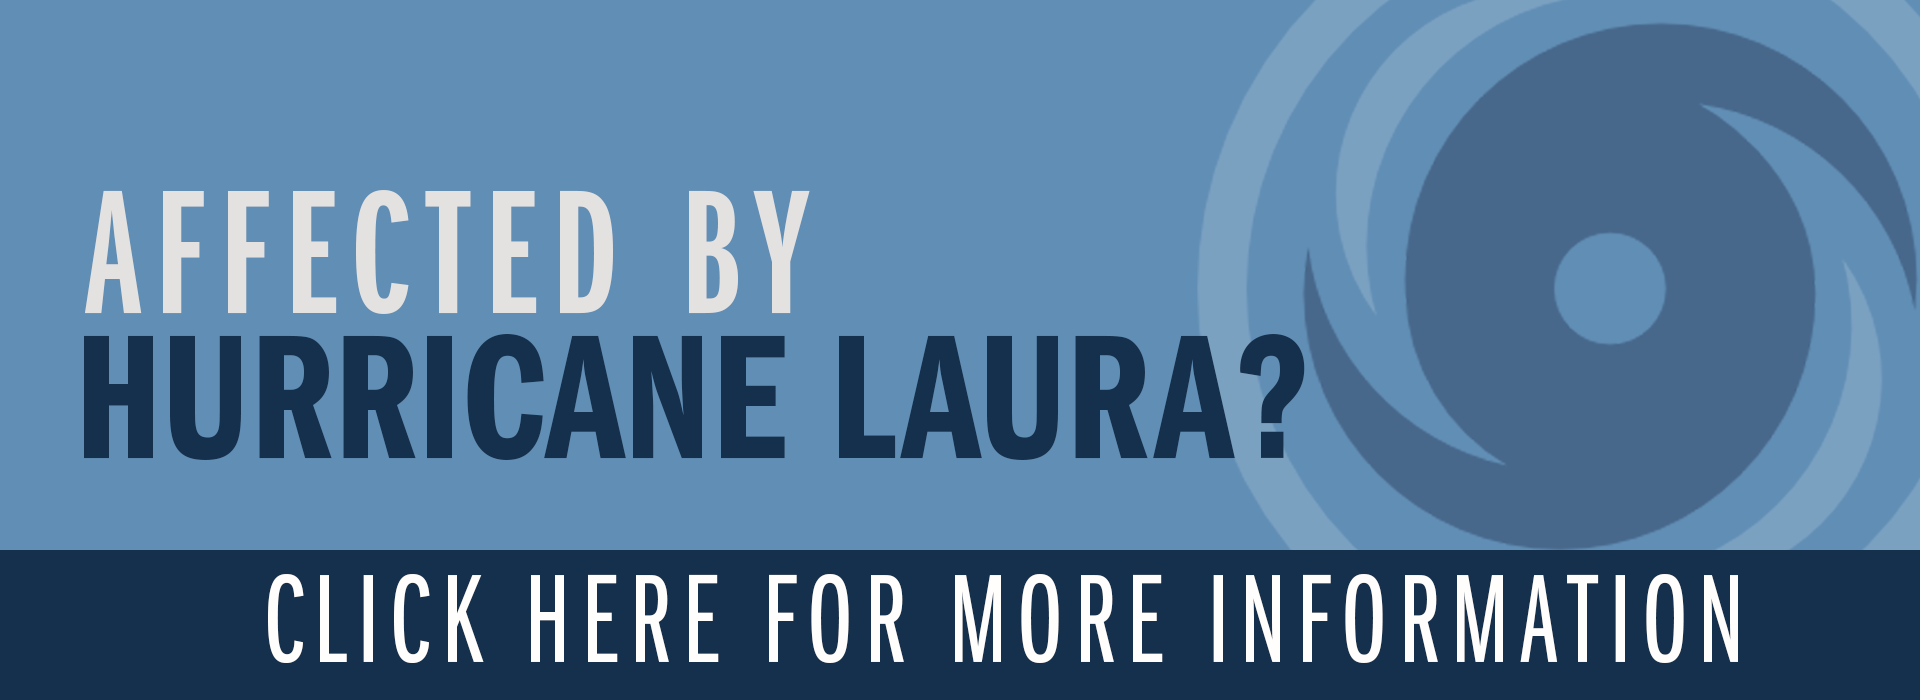 hurricane laura mortgage disaster help